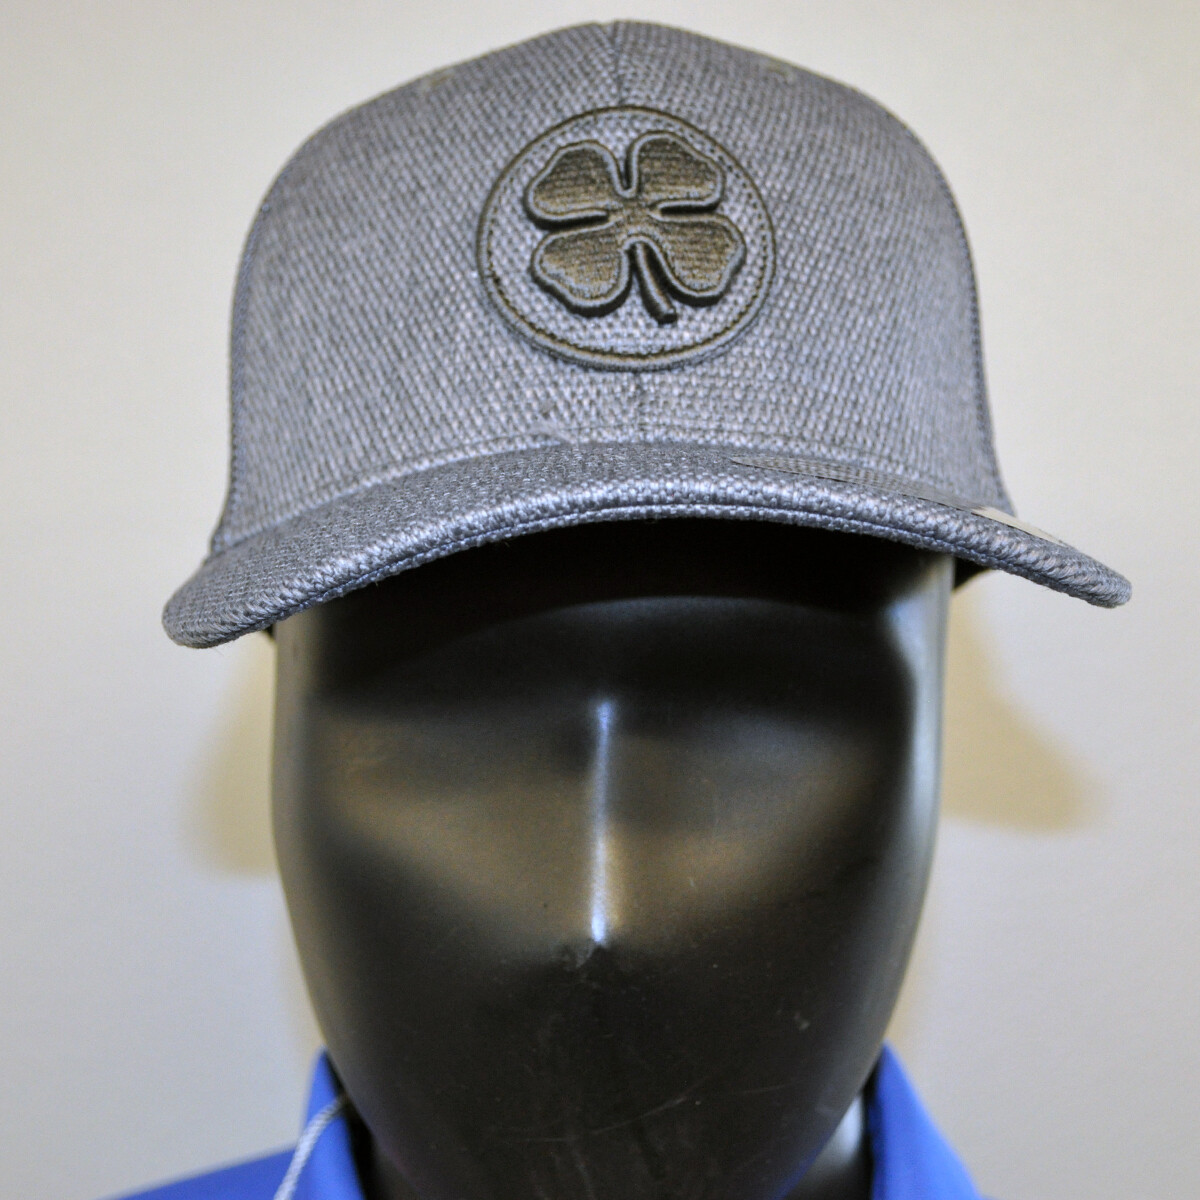 Men's Golf Hat- Live Lucky hat - OSFA Gray/Gray